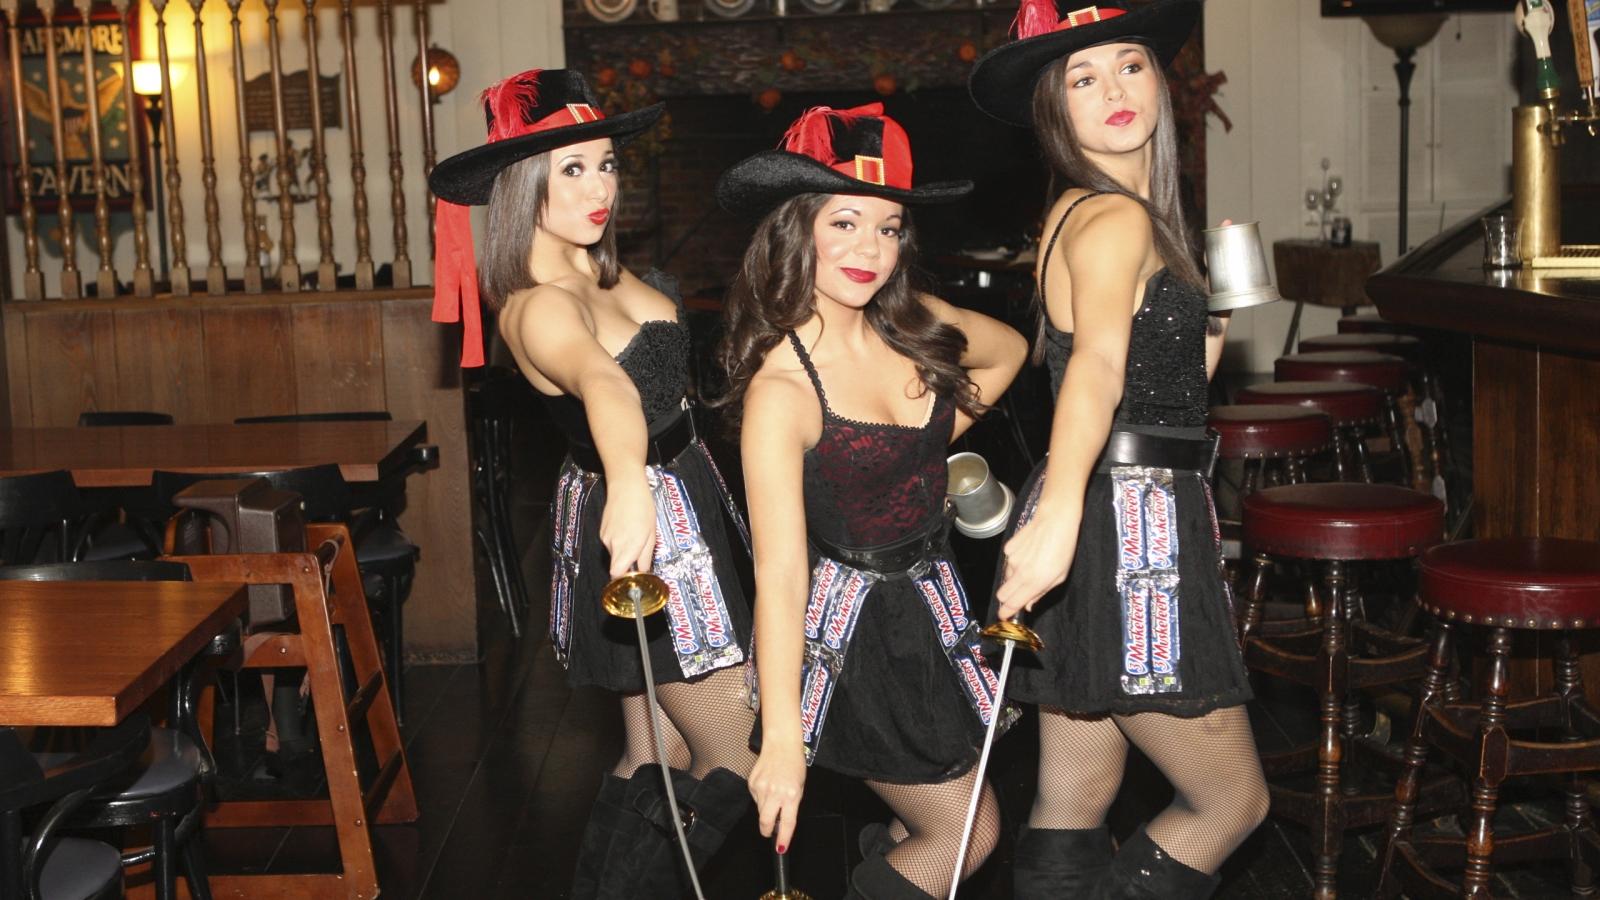 Tres Chicas mosqueteros - 1600x900